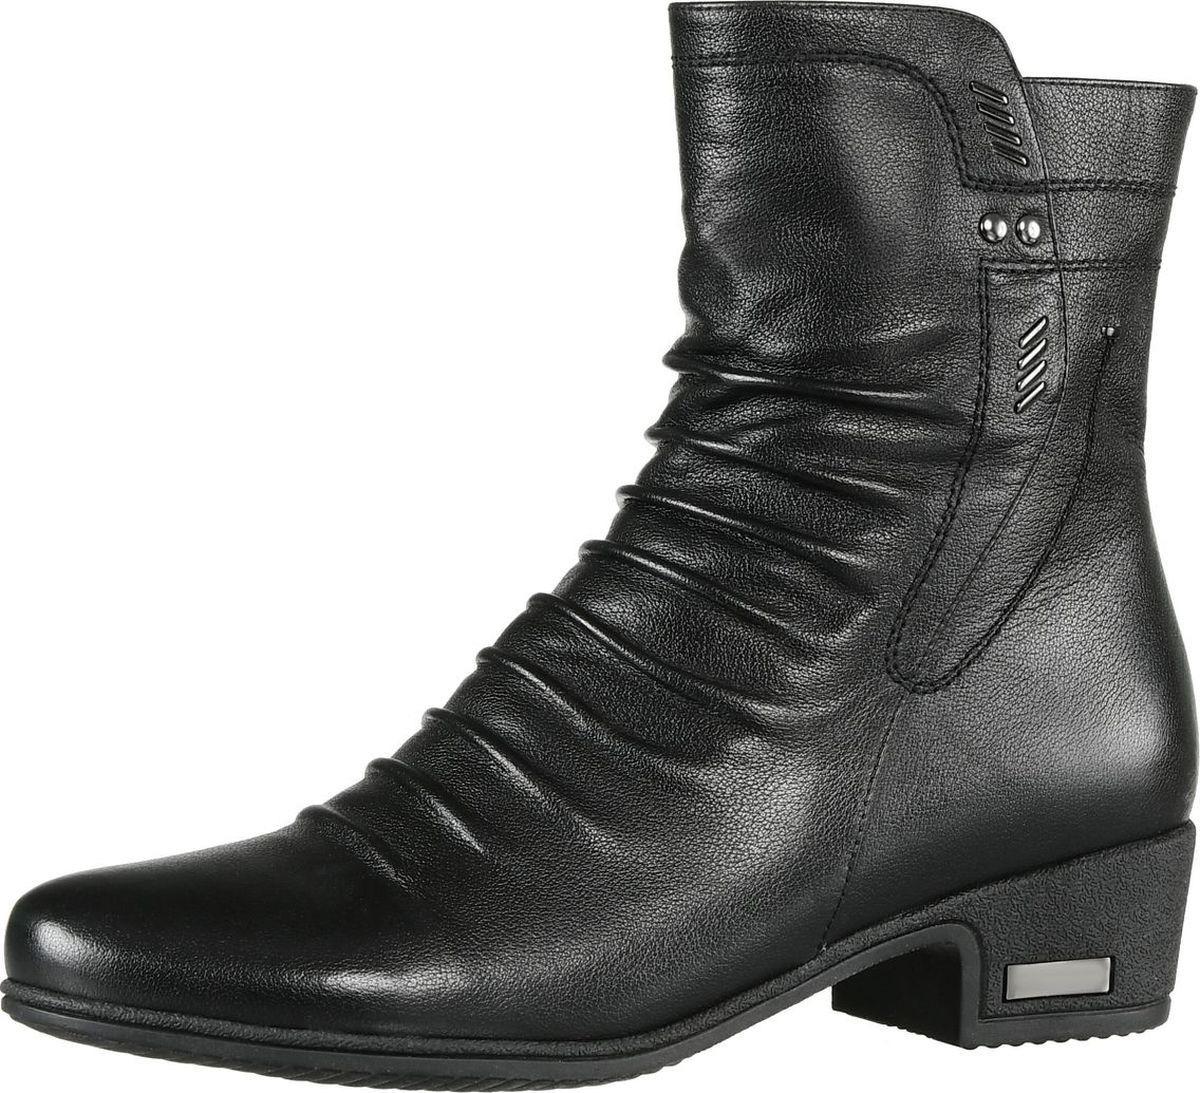 Ботинки Evalli free shipping 10pcs lot 3771 mb3771 sop 8 new original